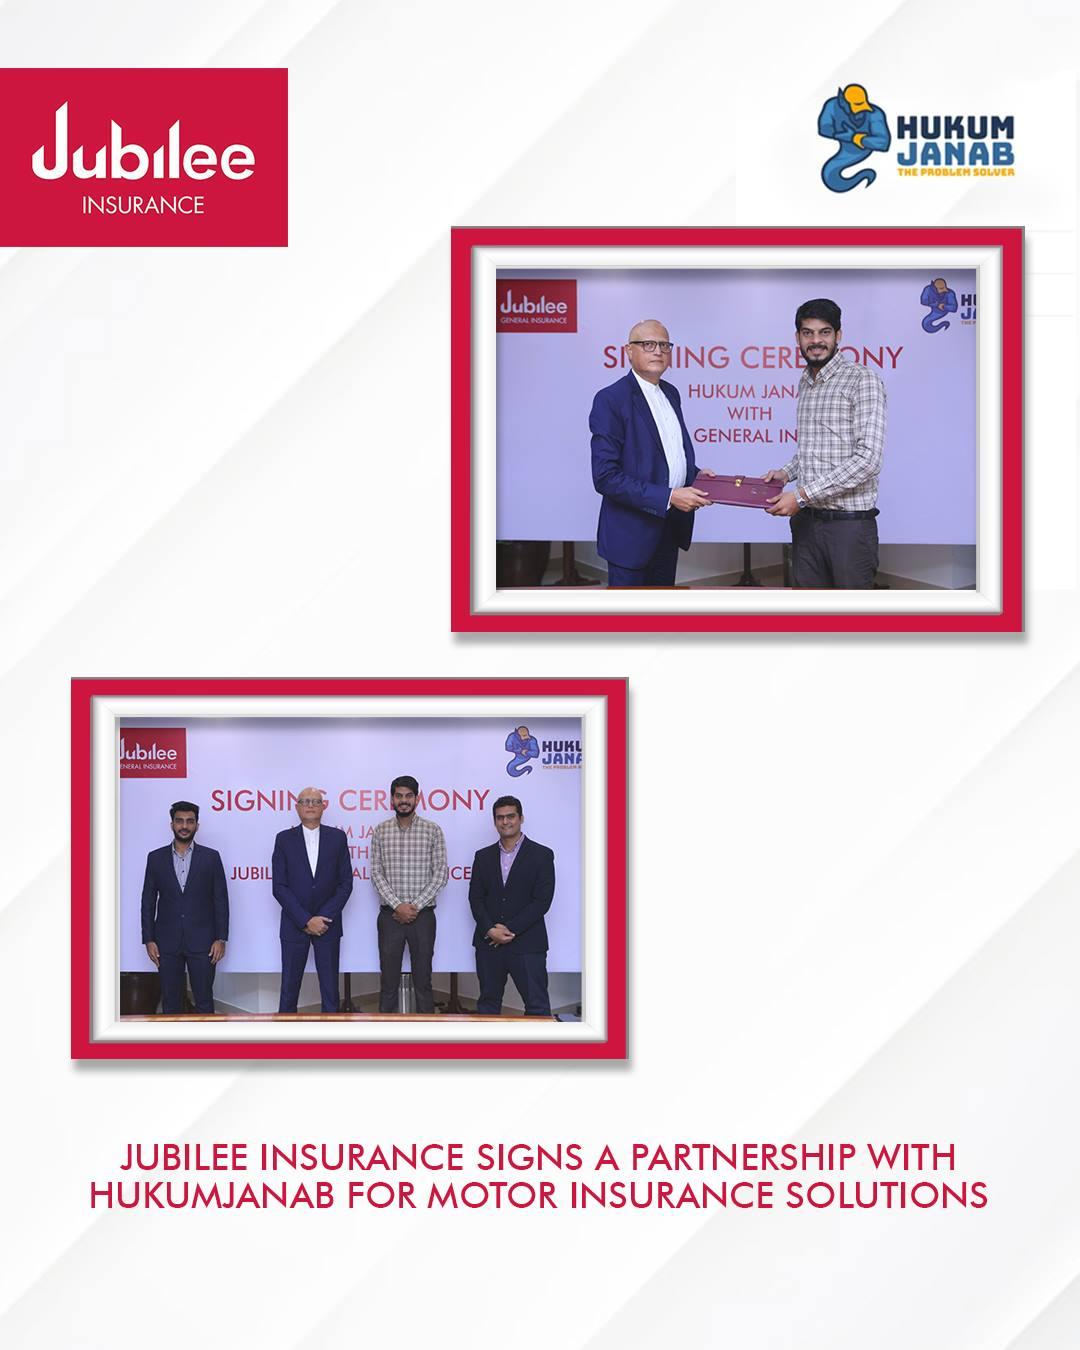 Jubilee General Insurance Partners with HukumJanab